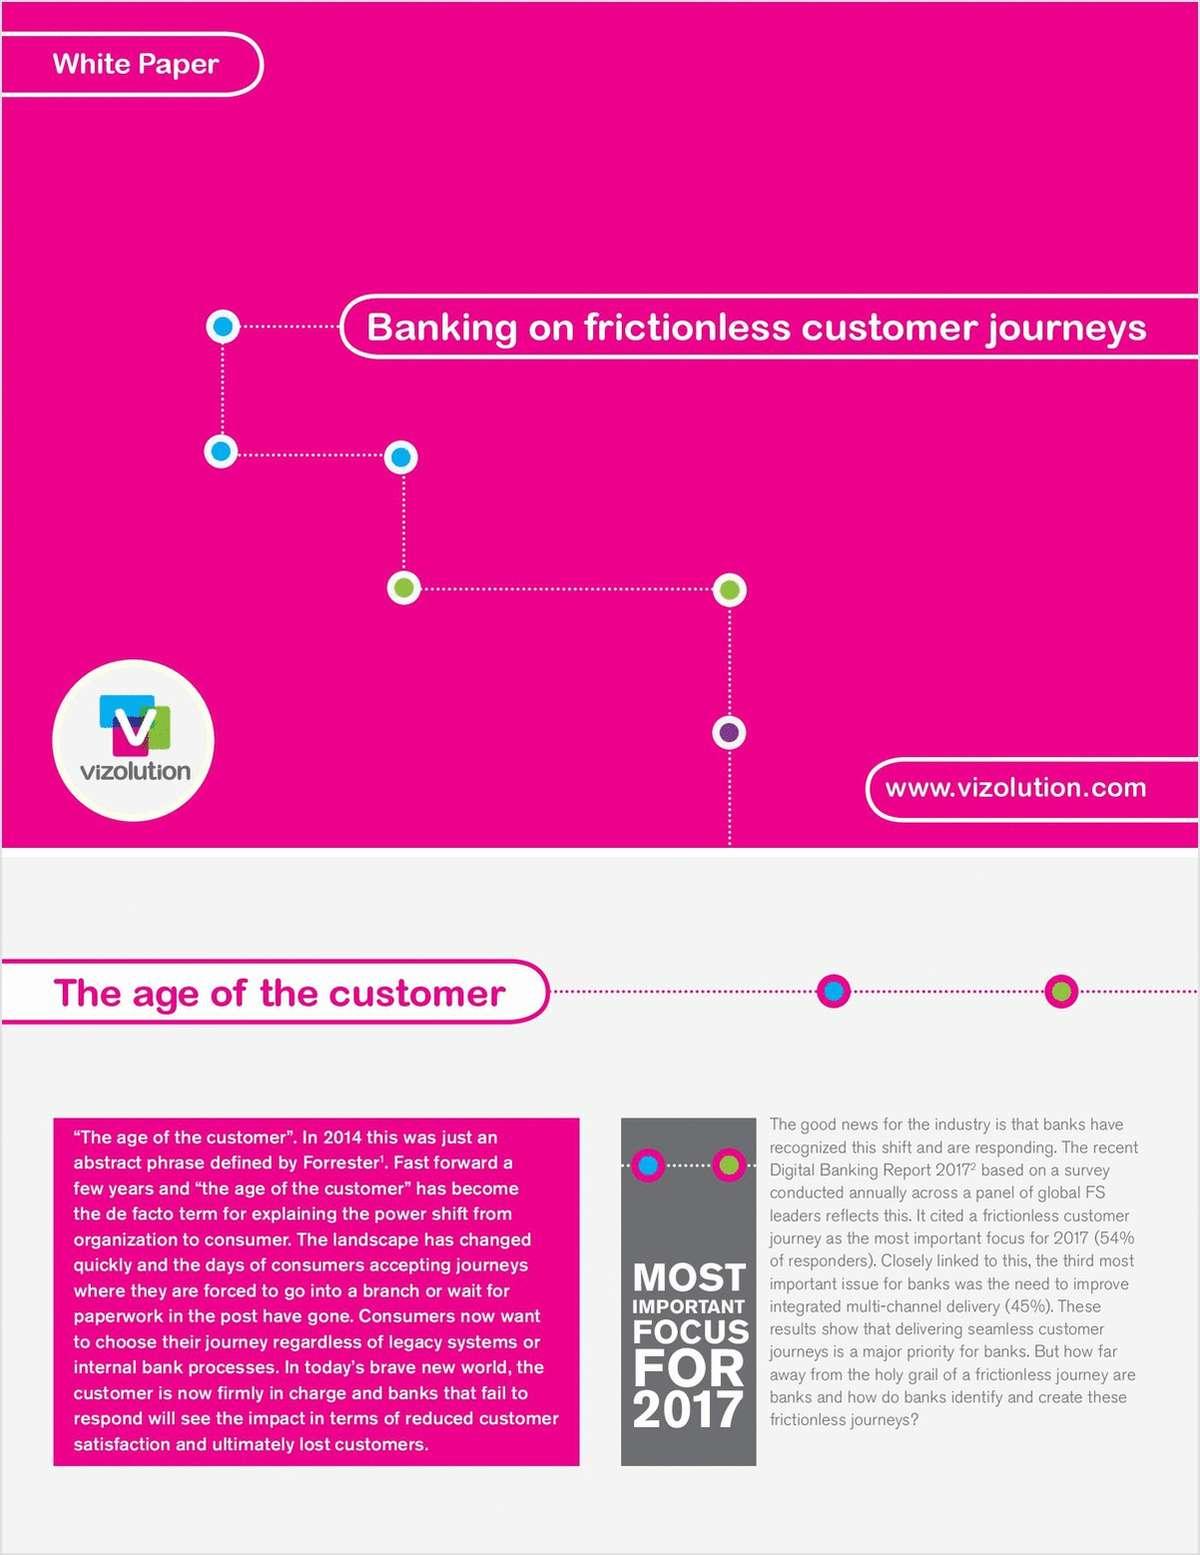 Banking on Frictionless Customer Journeys - USA